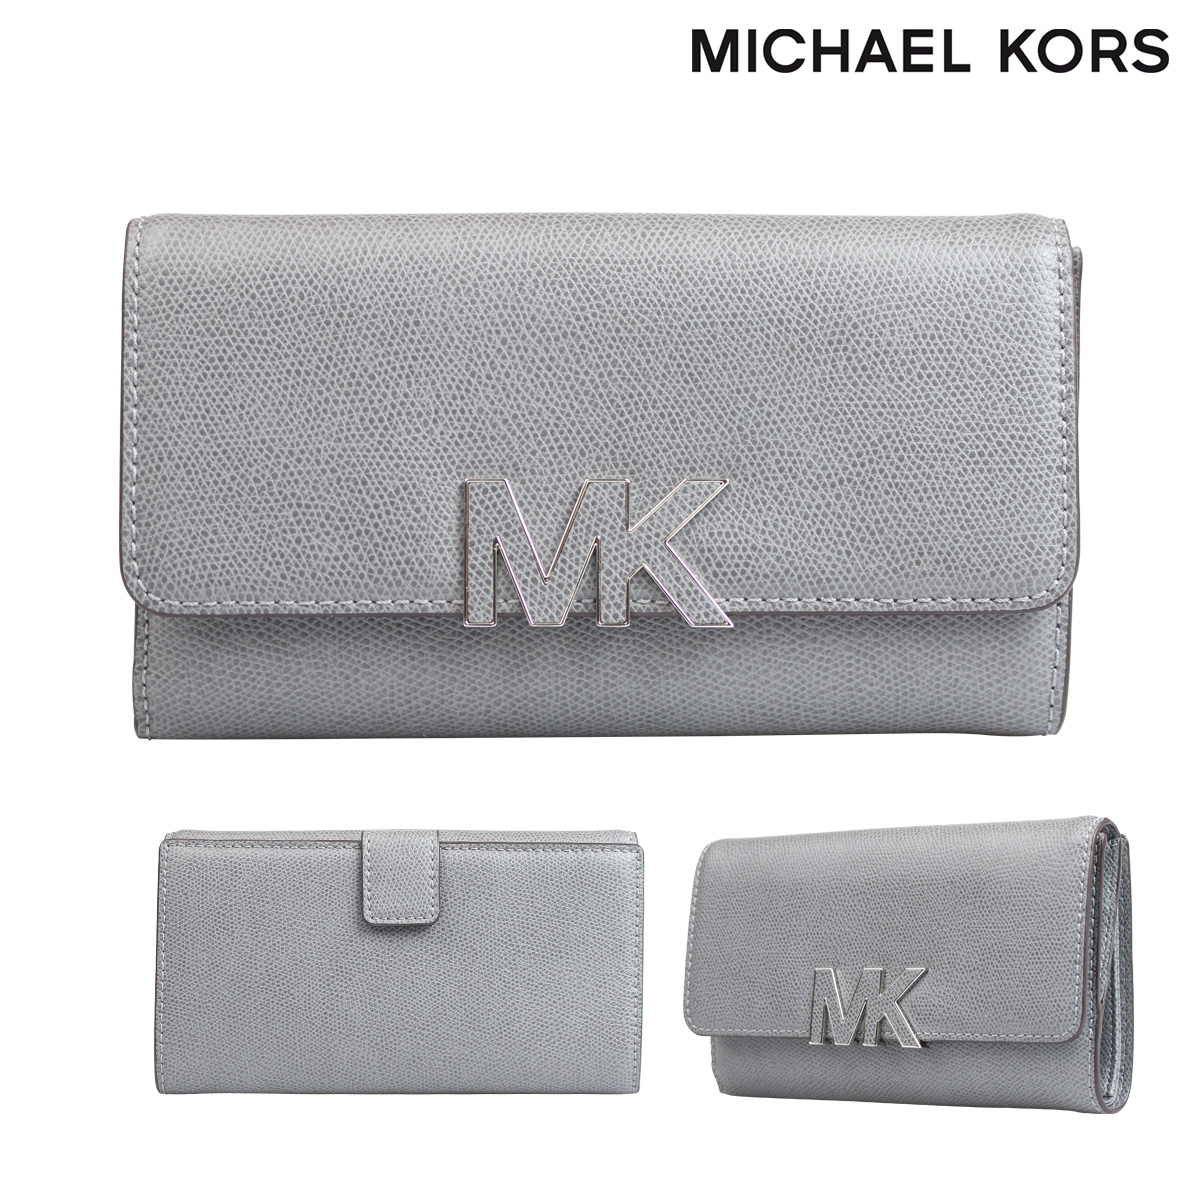 1e076dcac83d Sugar Online Shop  Michael Kors MICHAEL KORS wallets purse ...